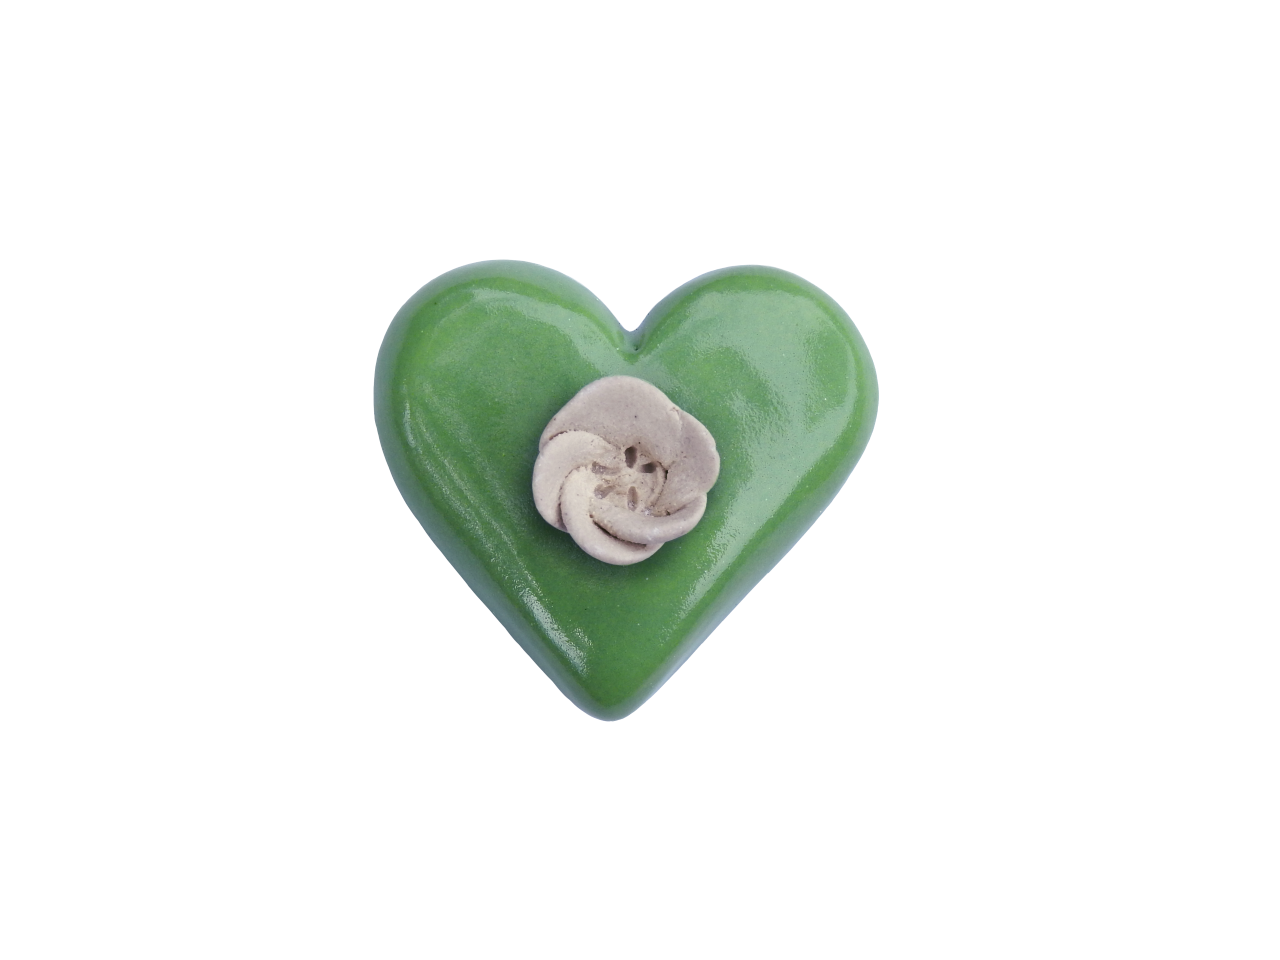 Flowering Heart Project